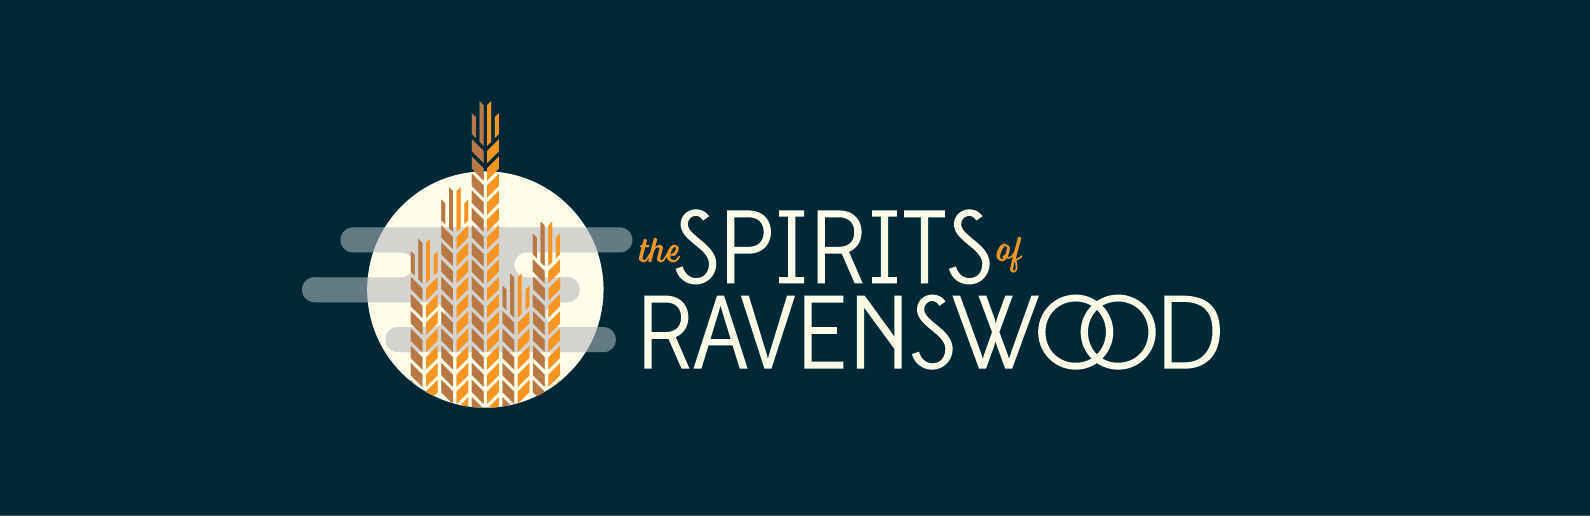 The Spirits of Ravenswood image